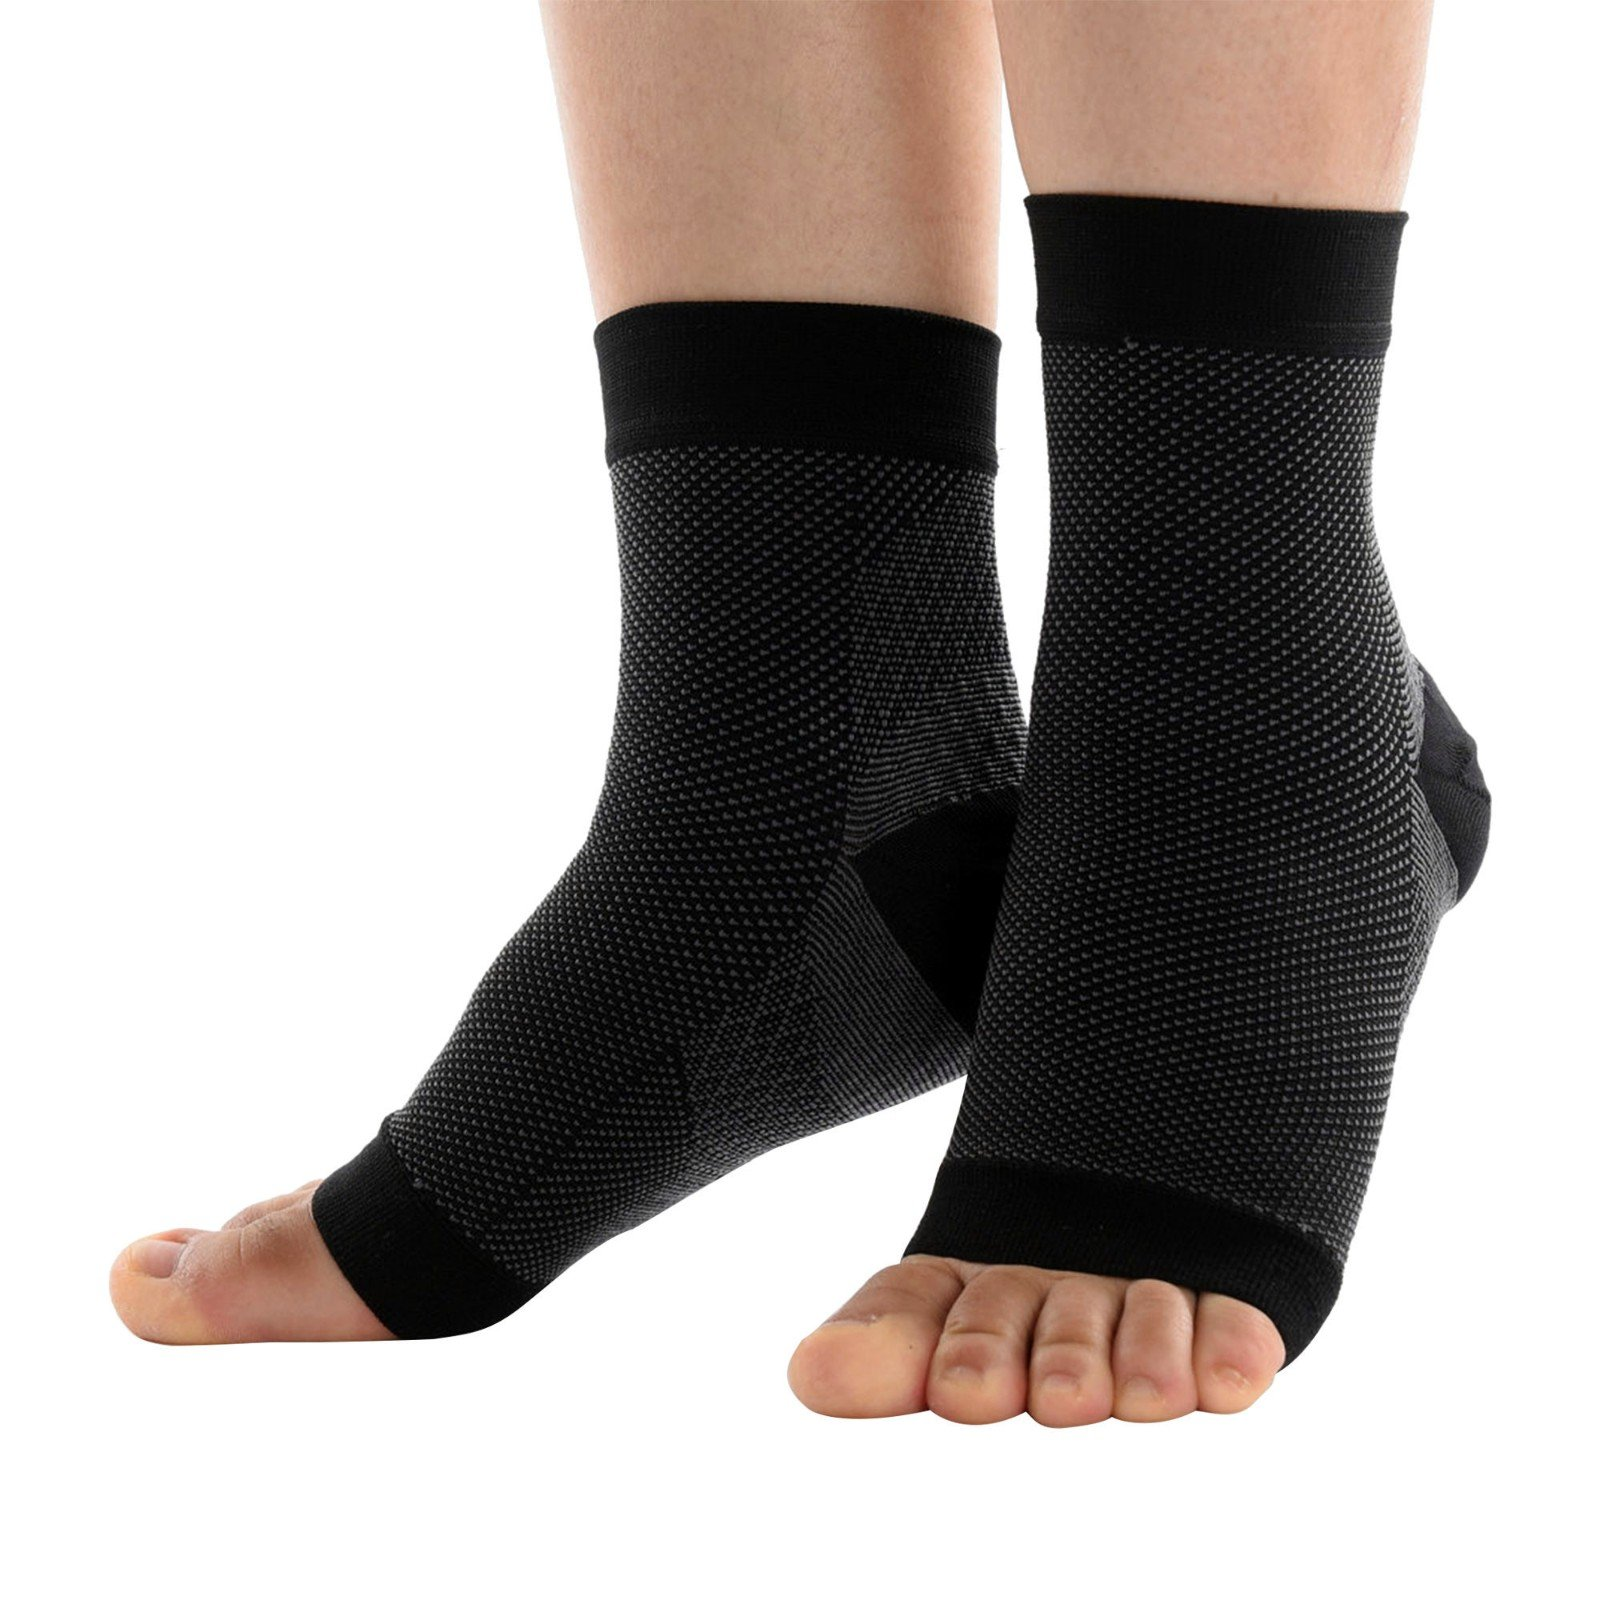 Beauty7 Pair Men Women Plantar Fasciitis Graduated Compression Socks Sleeve 20-30 mmHg Ankle Arch Support Foot Heel Pain Relief Achilles Tendonitis Brace FDA Approve Sports Nurse Pregnancy Black2 S/M